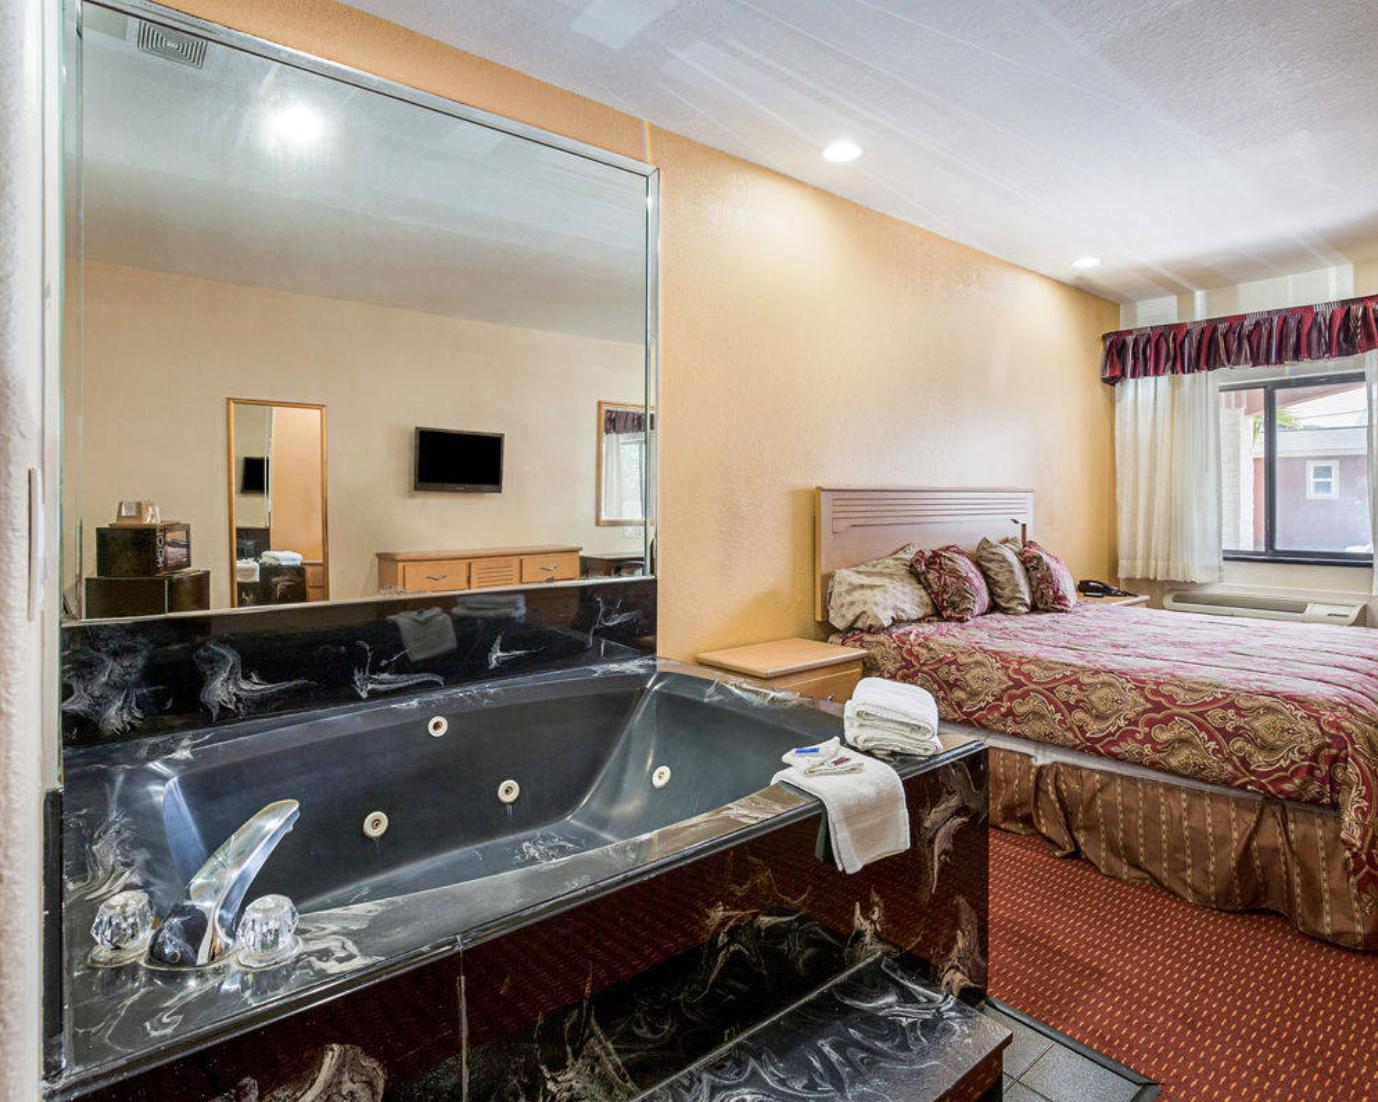 https://www.hotelsbyday.com/_data/default-hotel_image/1/7705/capture-d-e-cran-2017-10-06-a-11-27-01.png